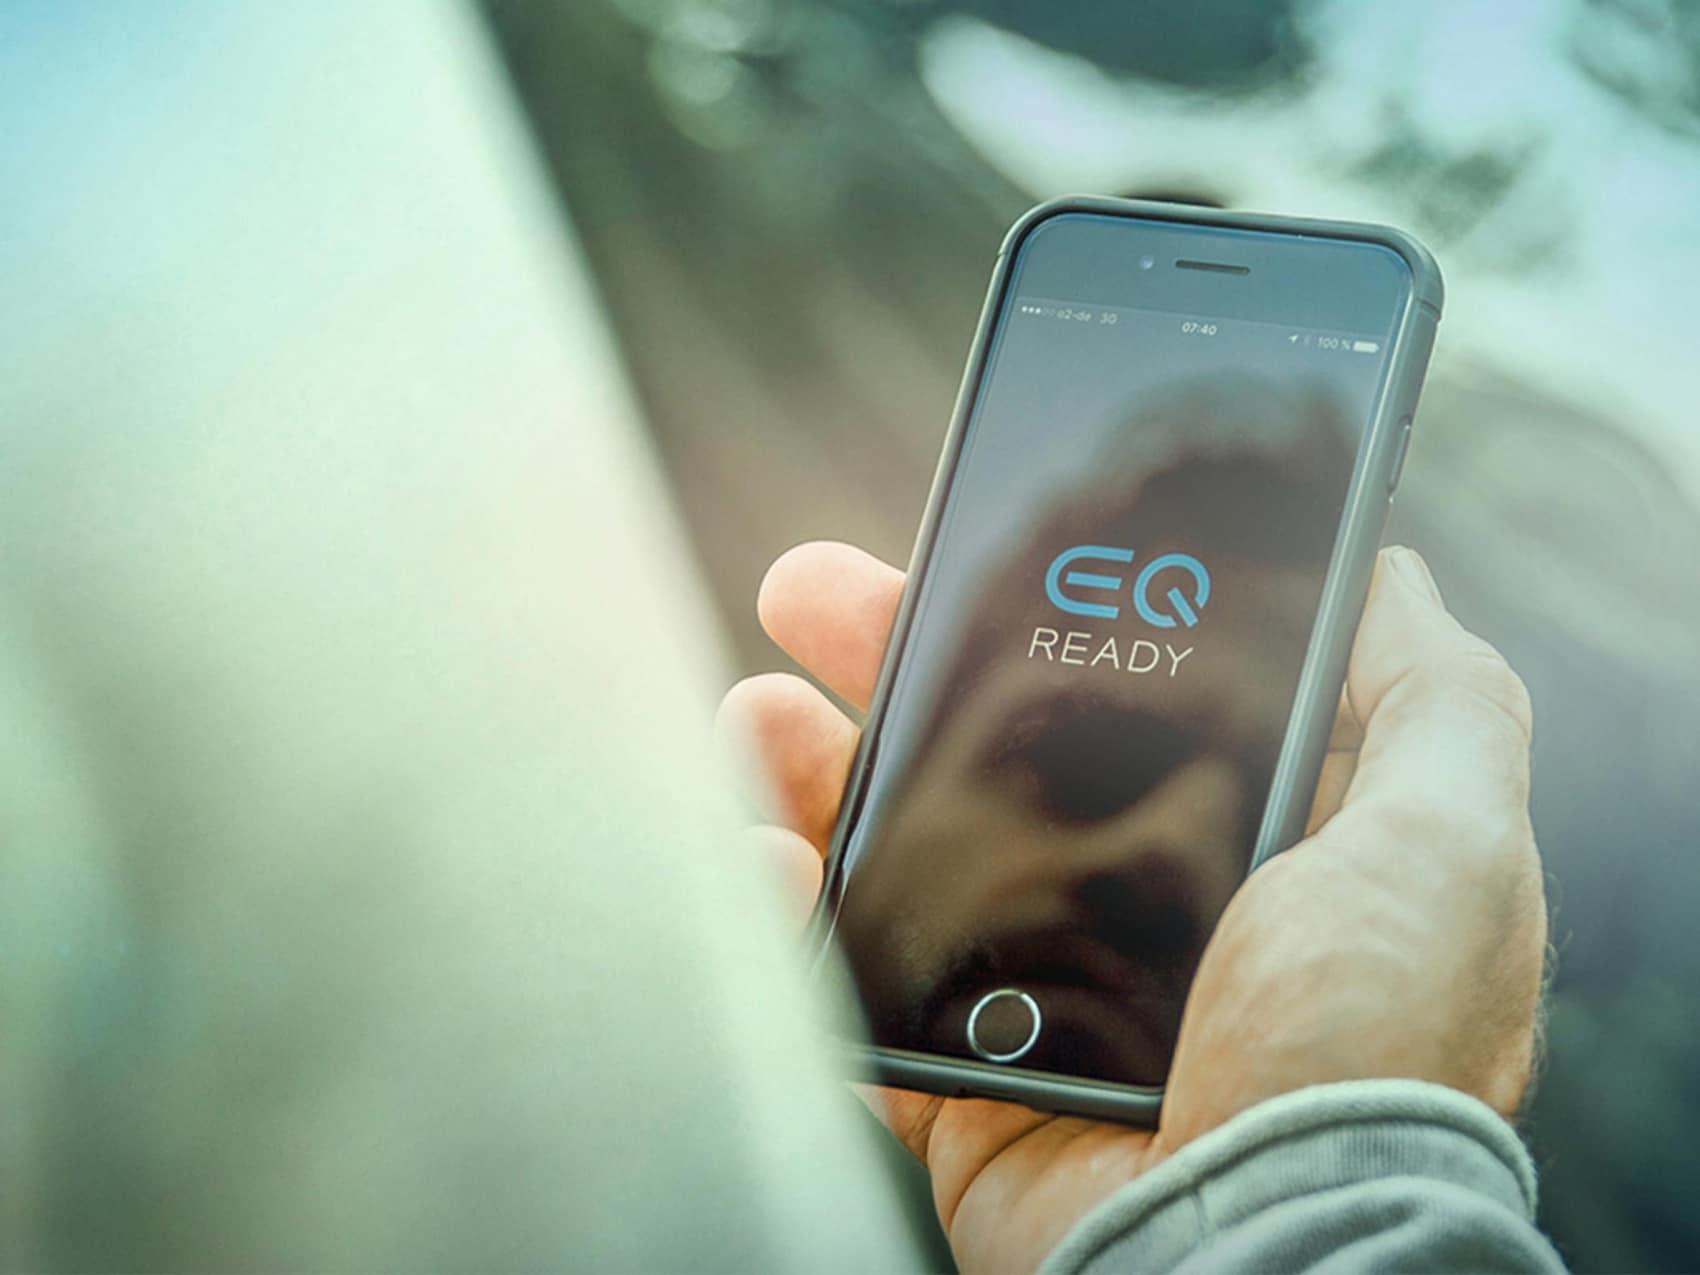 smart EQ Ready app